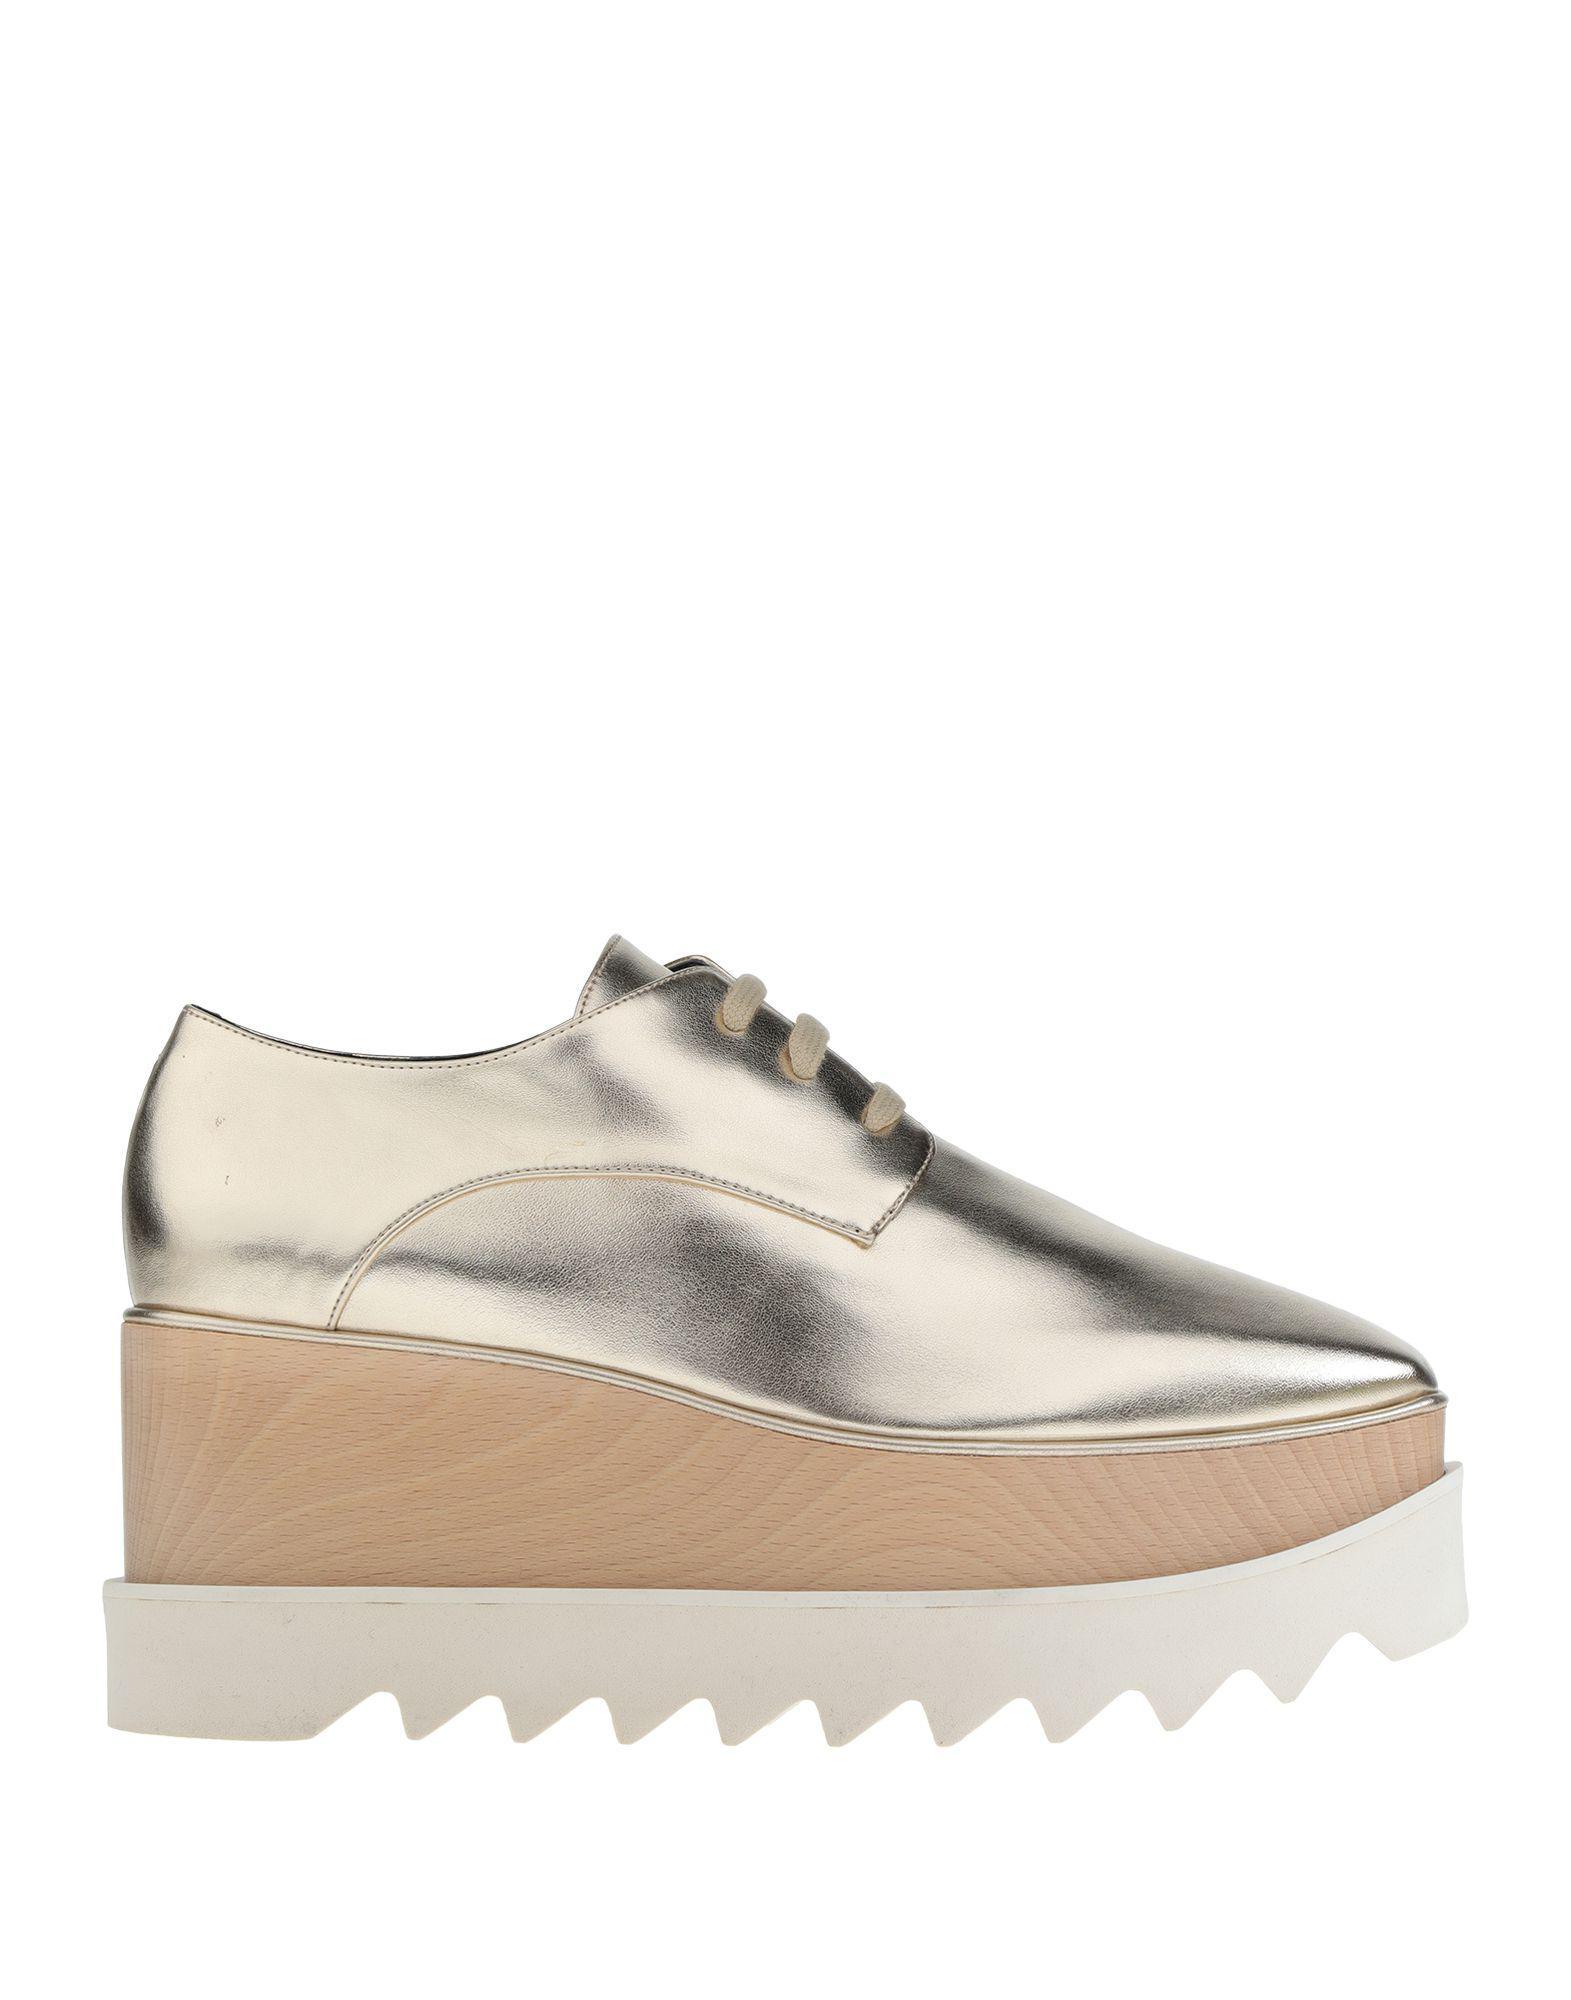 dc09c2c1cdd7 Stella McCartney. Women s Lace-up Shoe